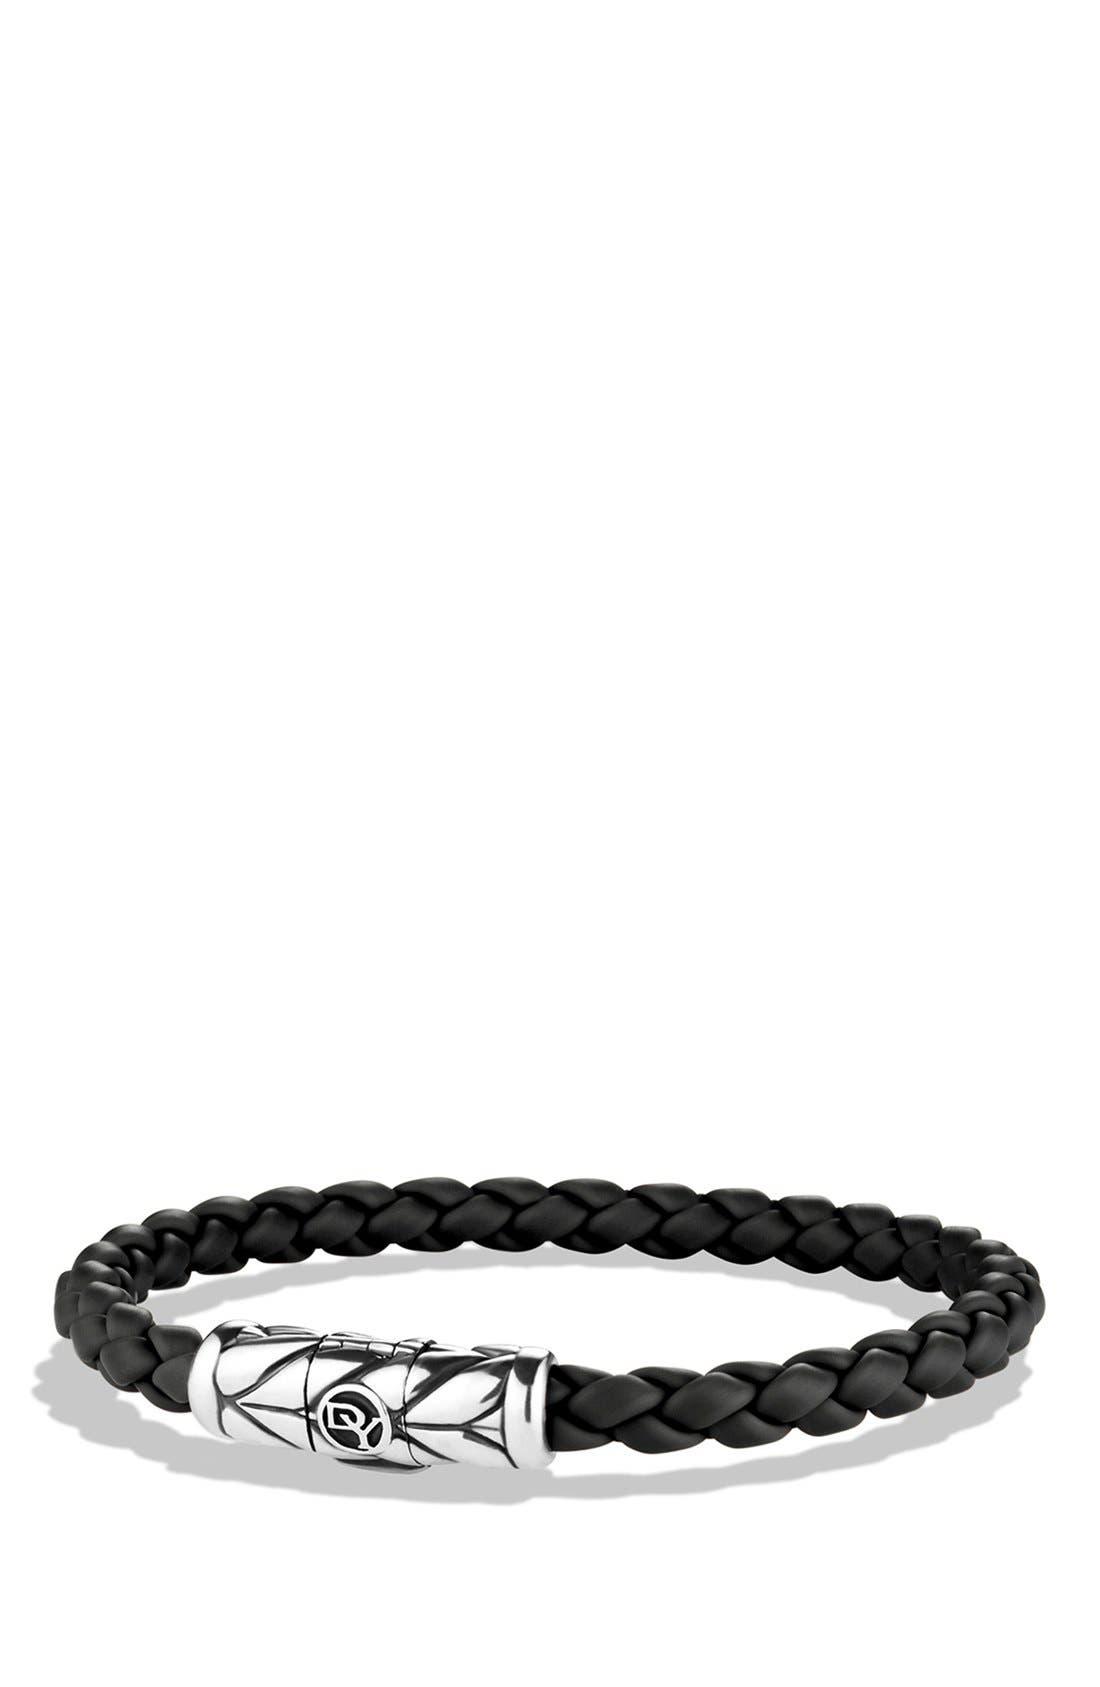 'Chevron' Woven Rubber Bracelet,                             Main thumbnail 1, color,                             BLACK